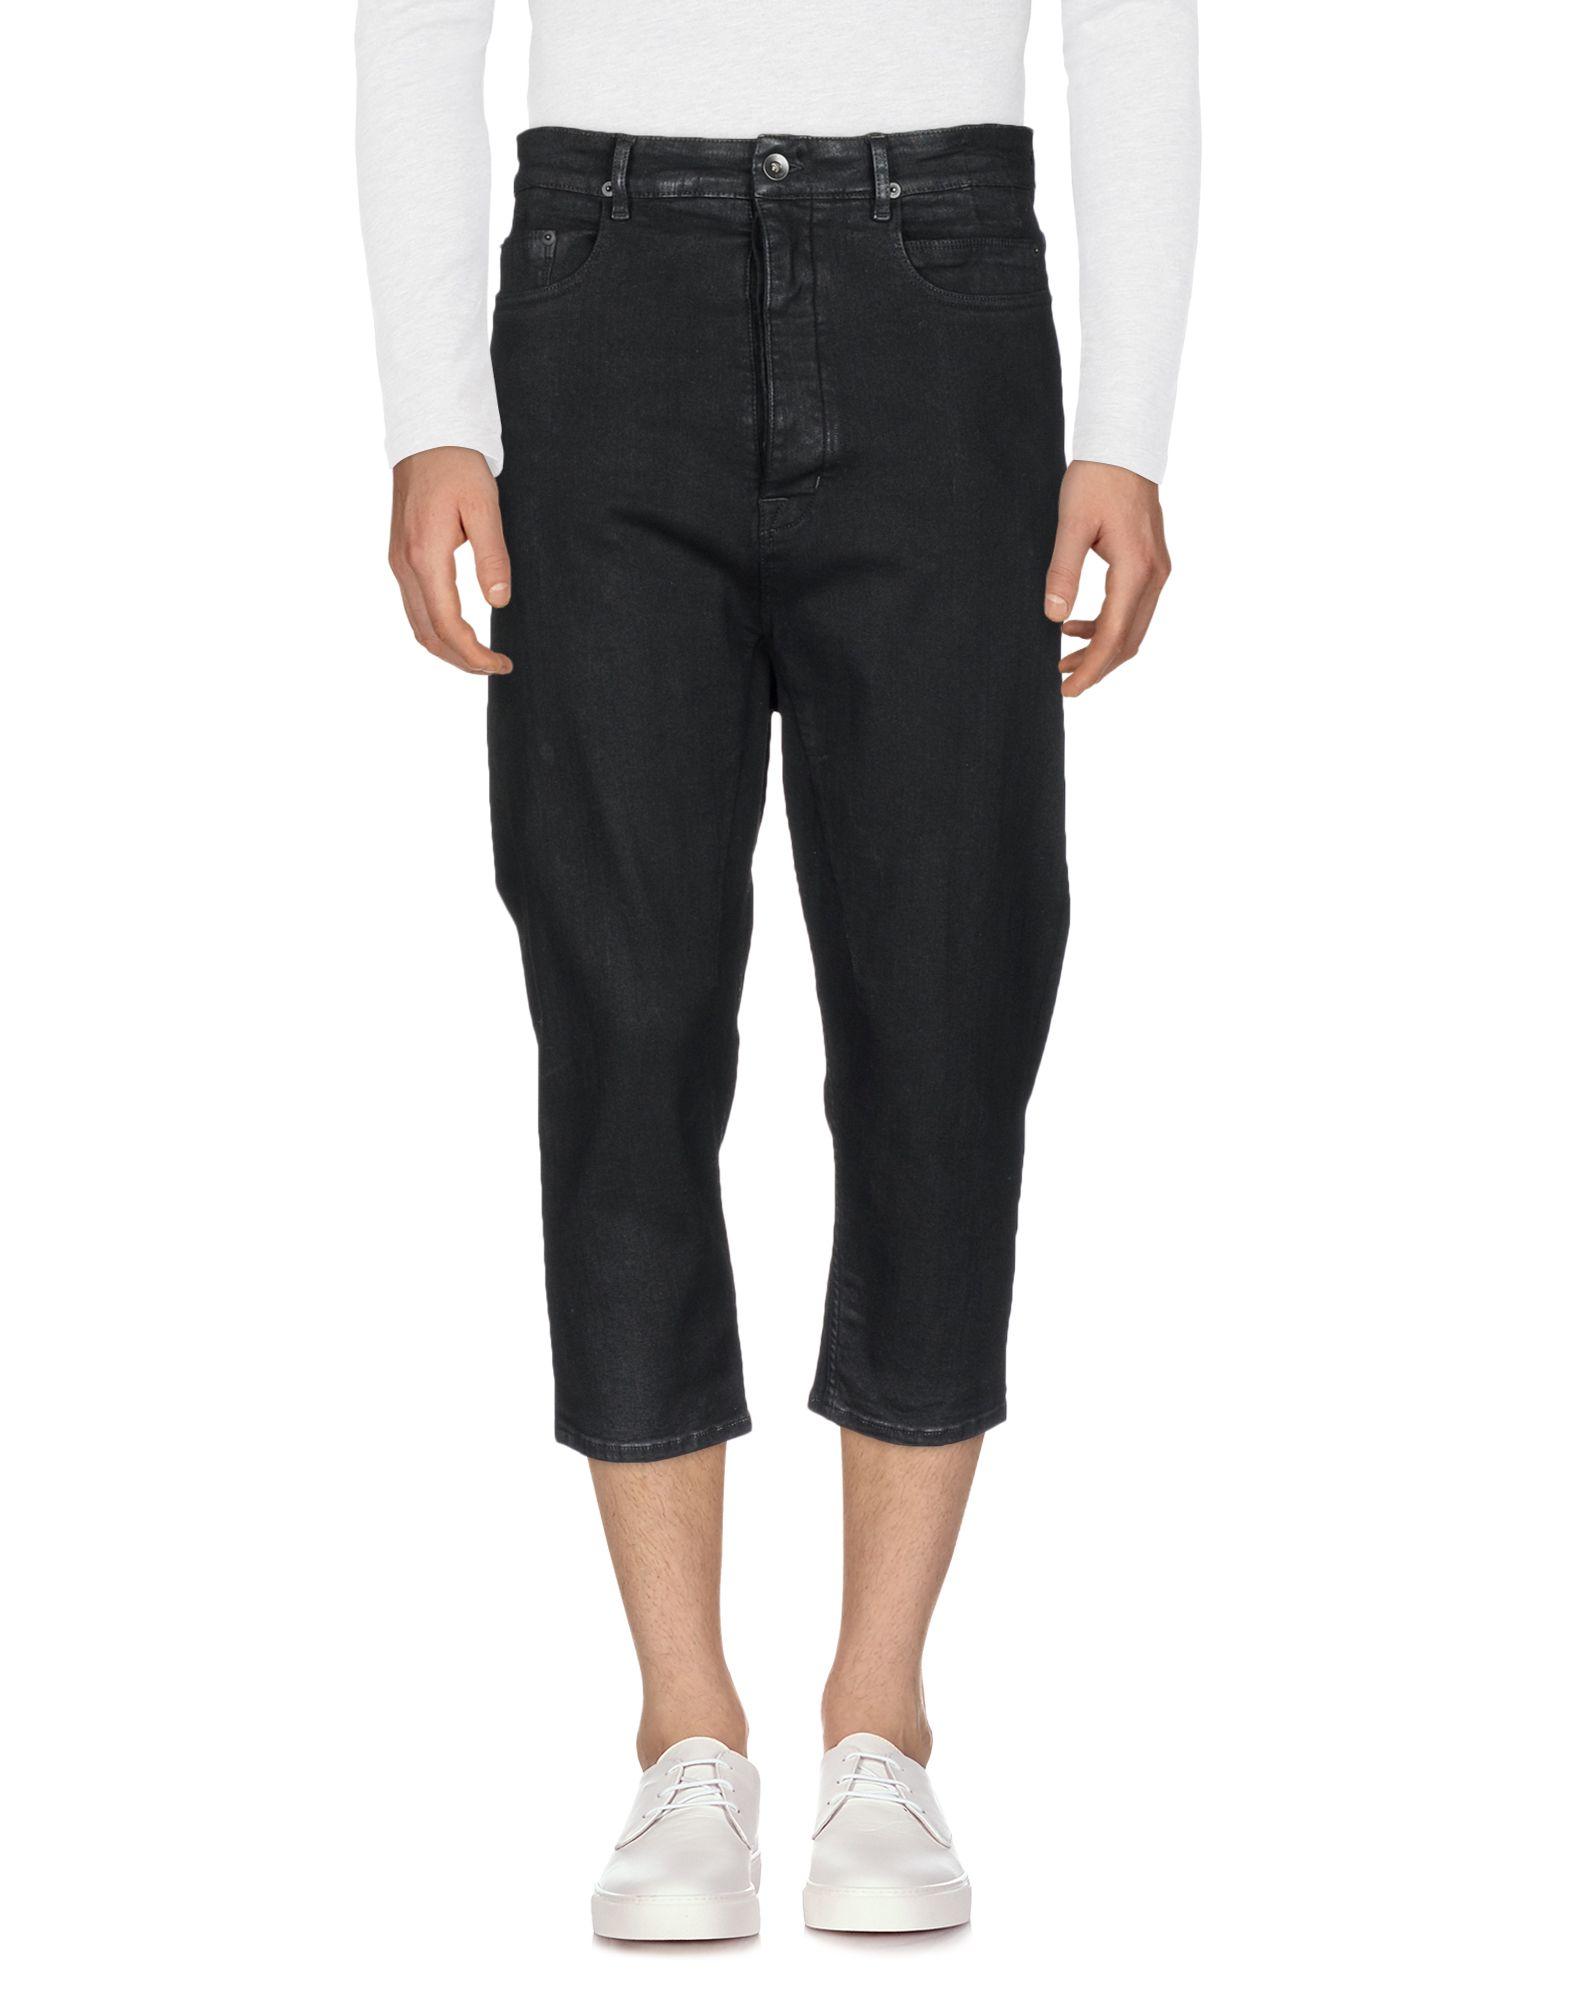 Pantaloni Jeans Drkshdw By Rick Owens Donna - Acquista online su